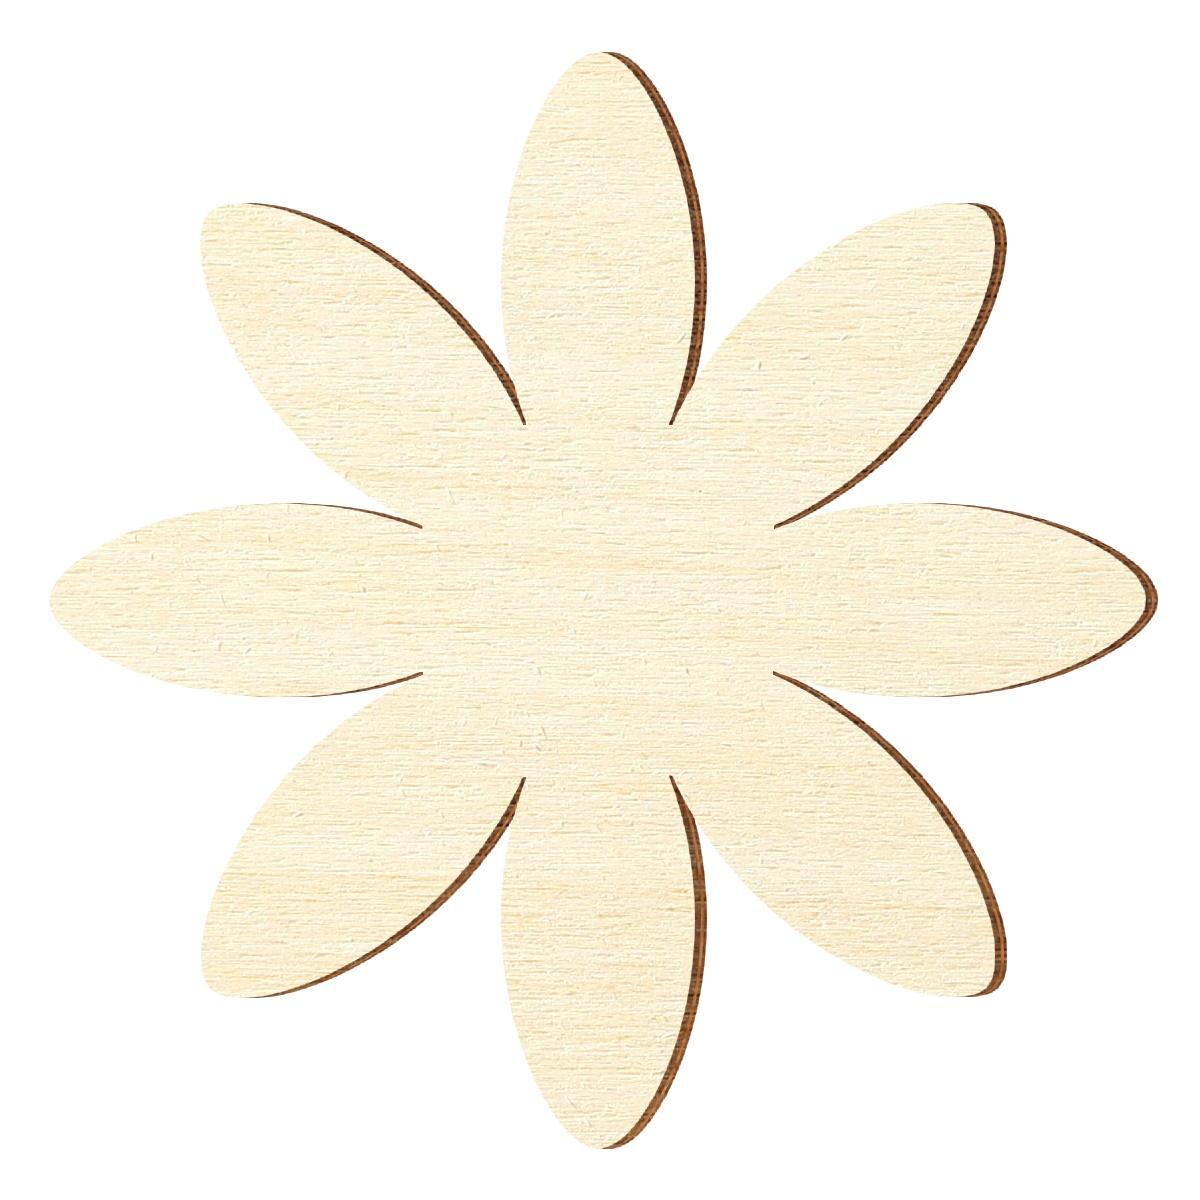 sperrholz zuschnitte margerite blume bl te gr enauswahl pappel 3mm ebay. Black Bedroom Furniture Sets. Home Design Ideas